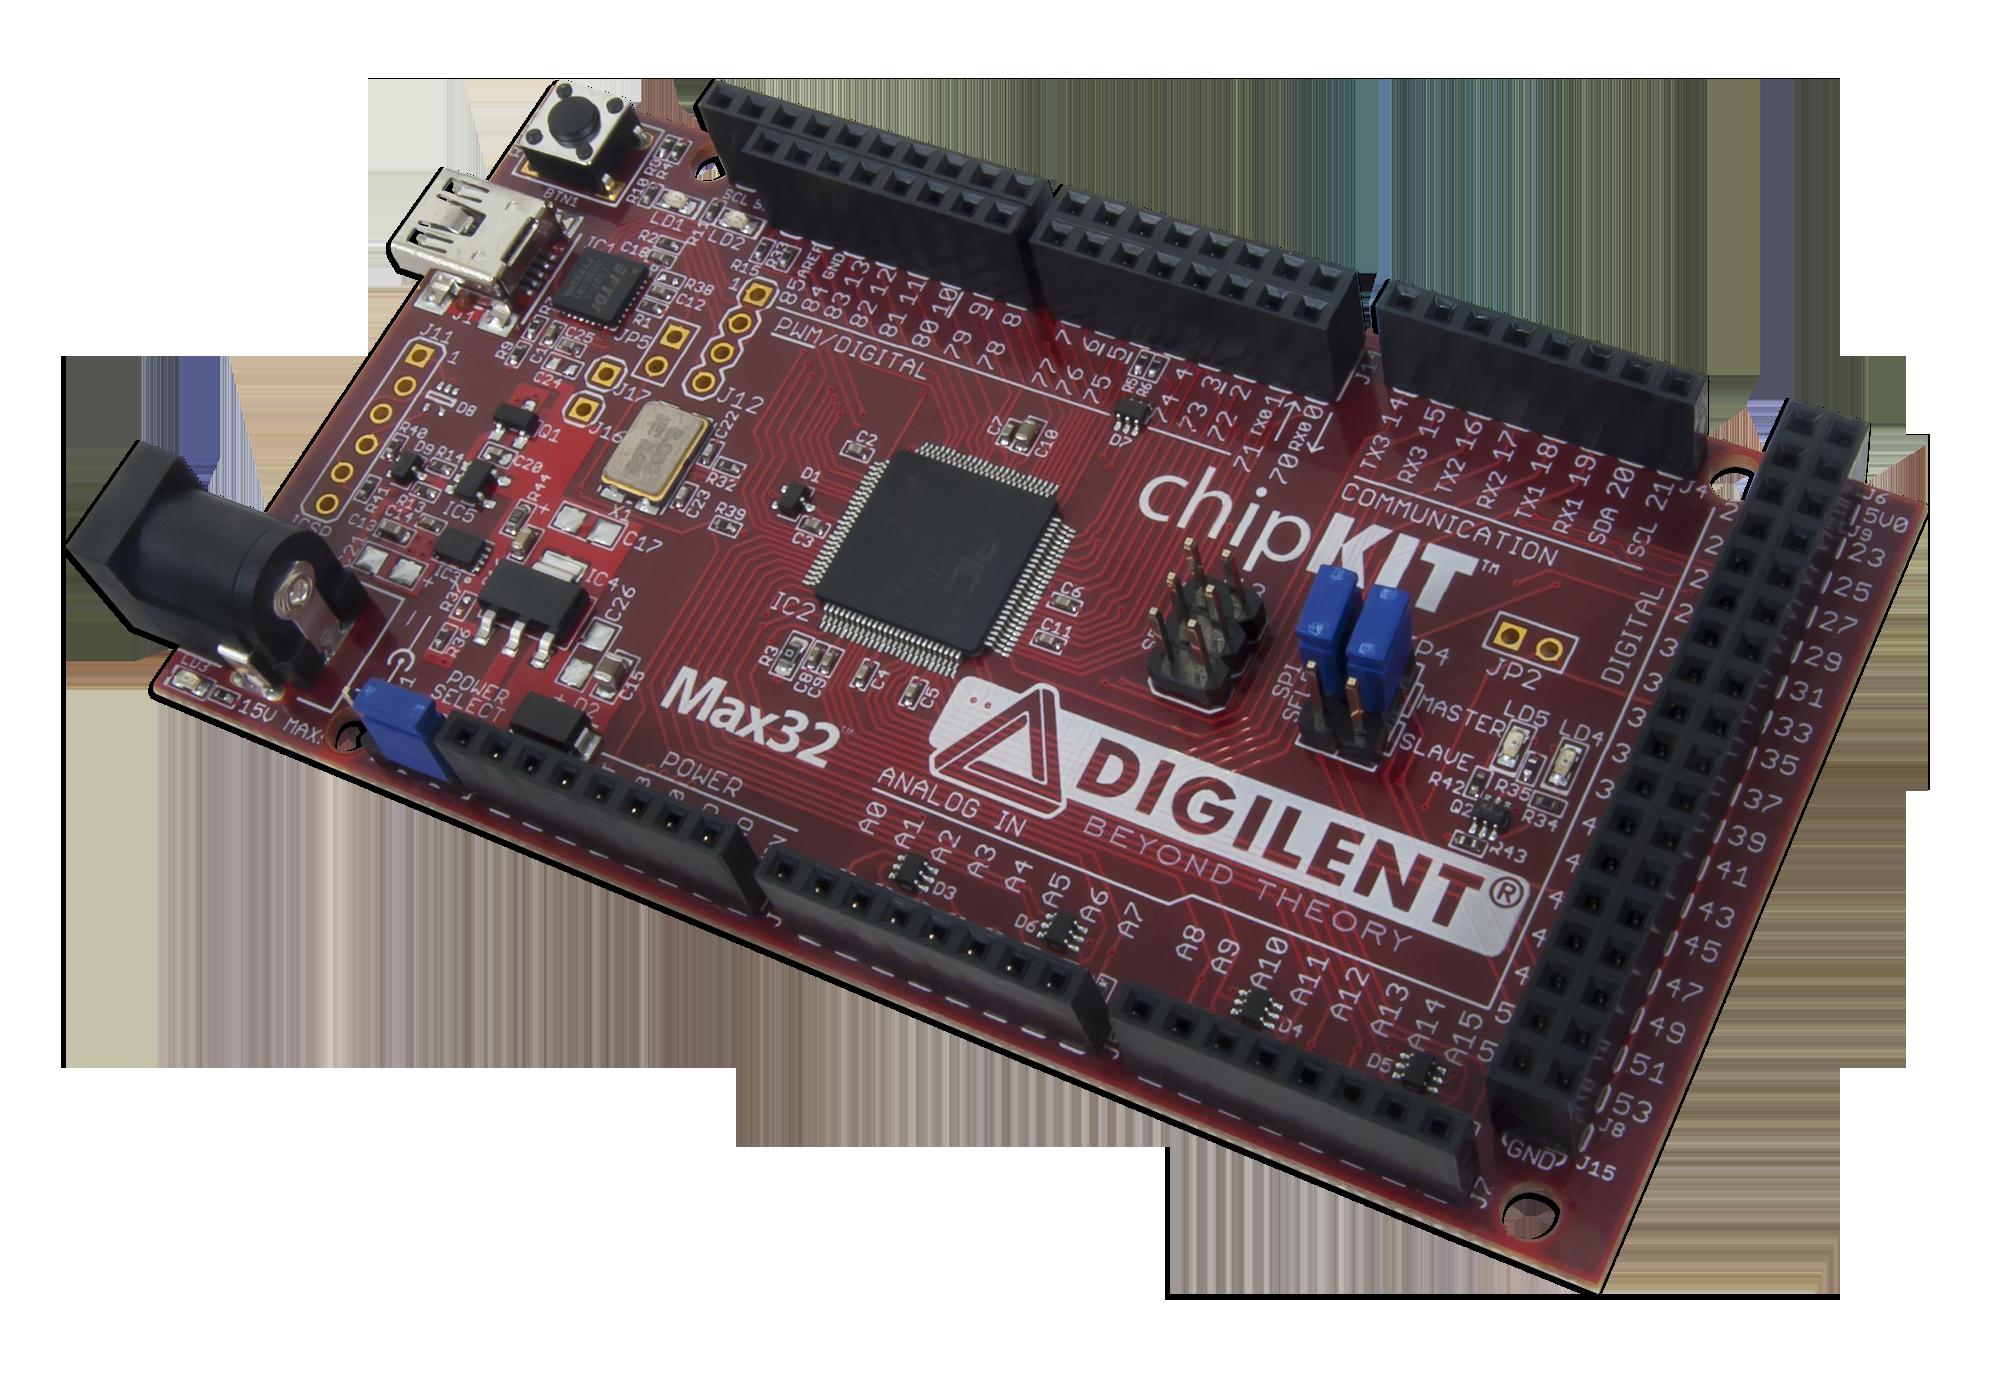 chipKIT™ Max32™ [Reference.Digilentinc] on